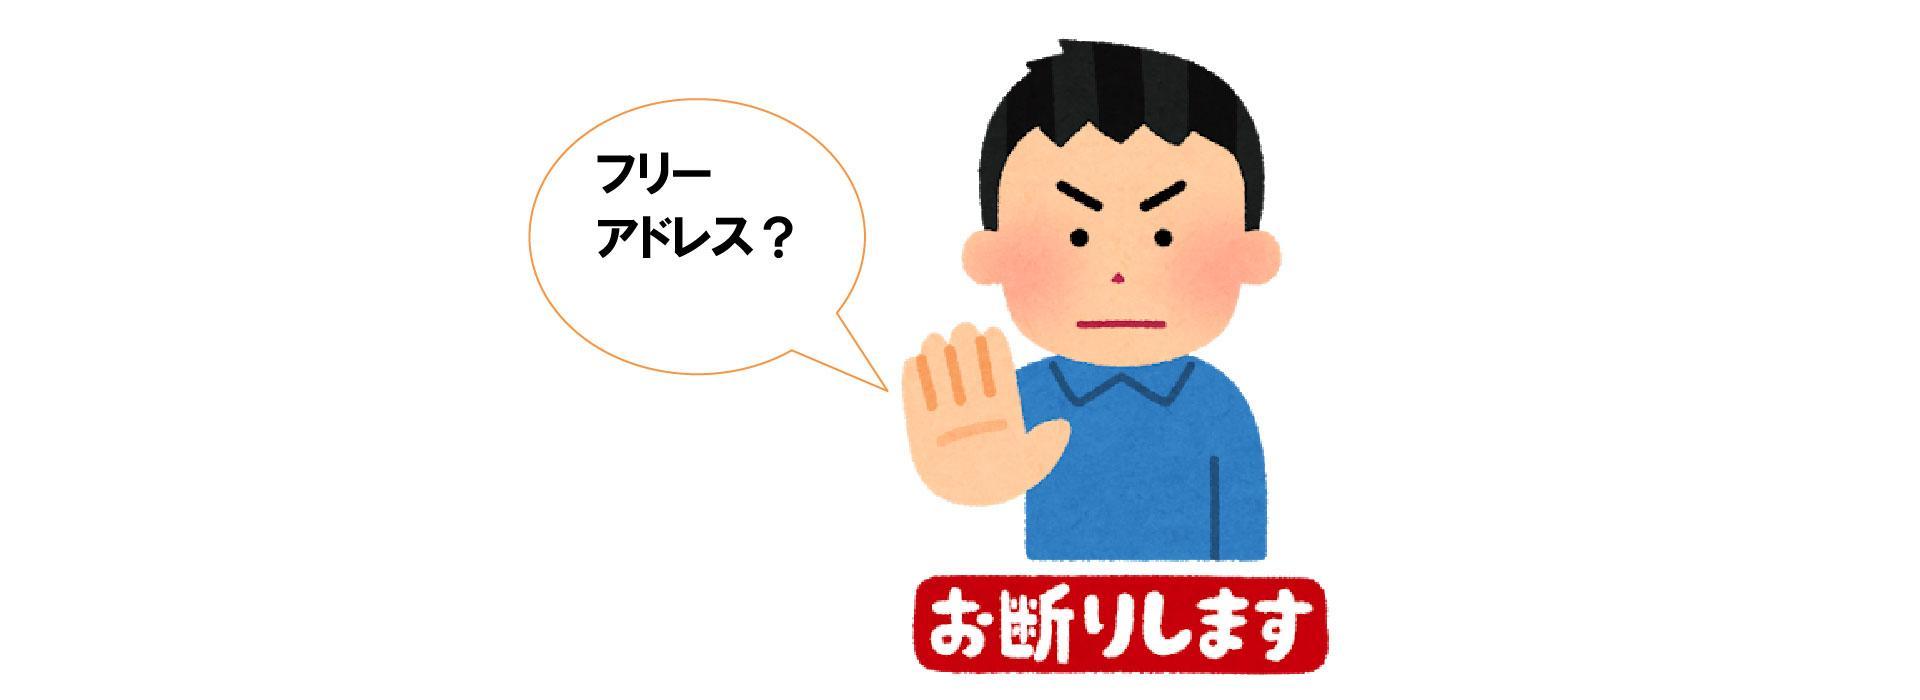 1_210121_soumublog.jpg